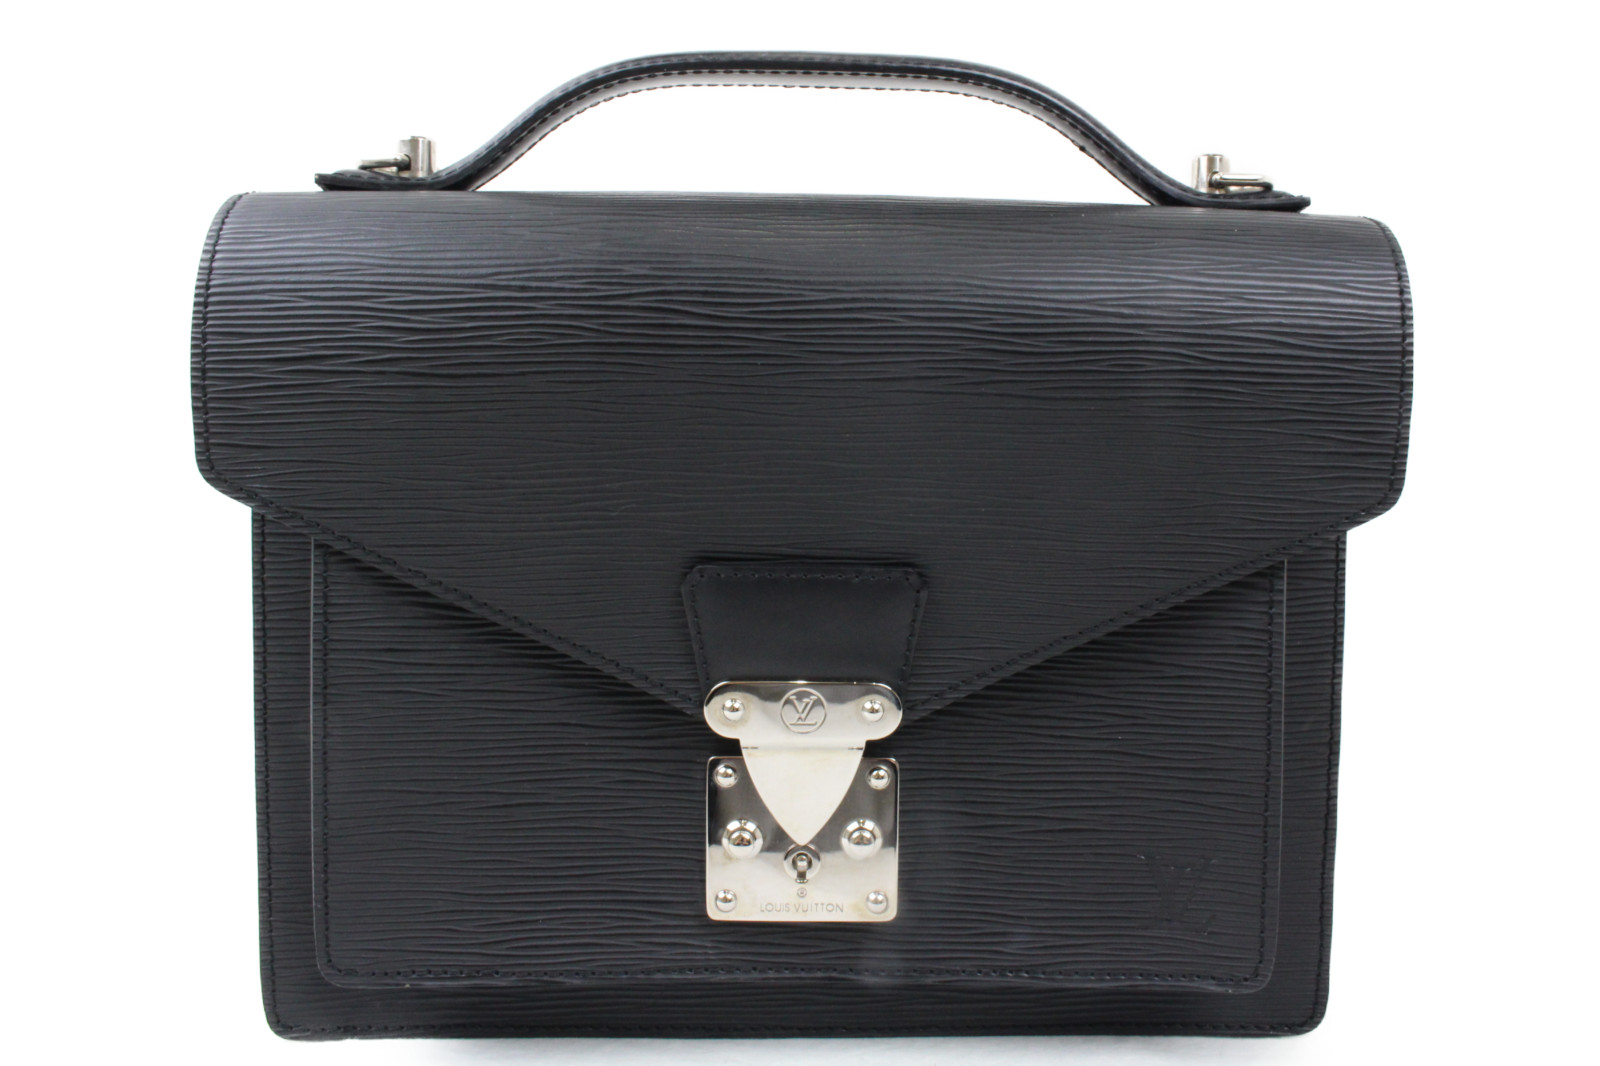 LOUIS VUITTONモンソー M52792セカンドバッグ クラッチバッグ エピプレゼント包装可【中古】